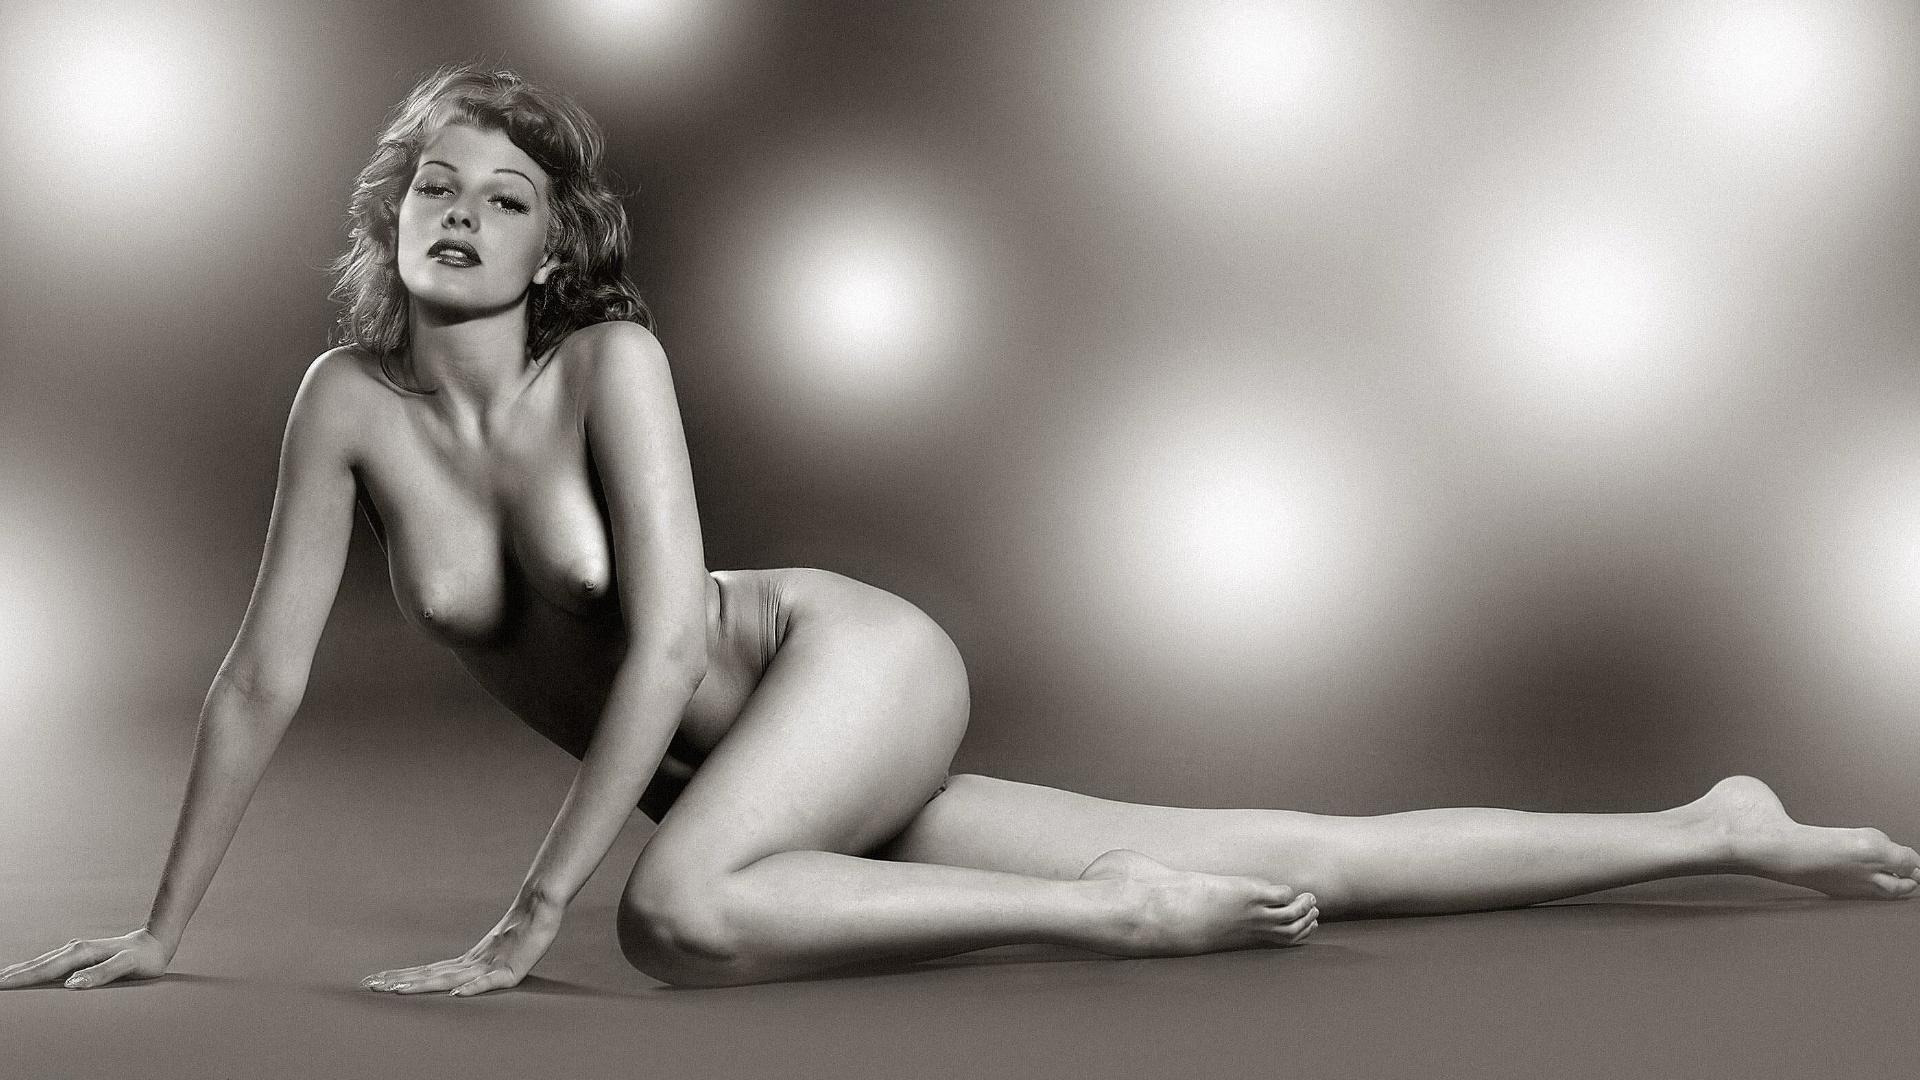 Rita hayworth fucking sexy movie